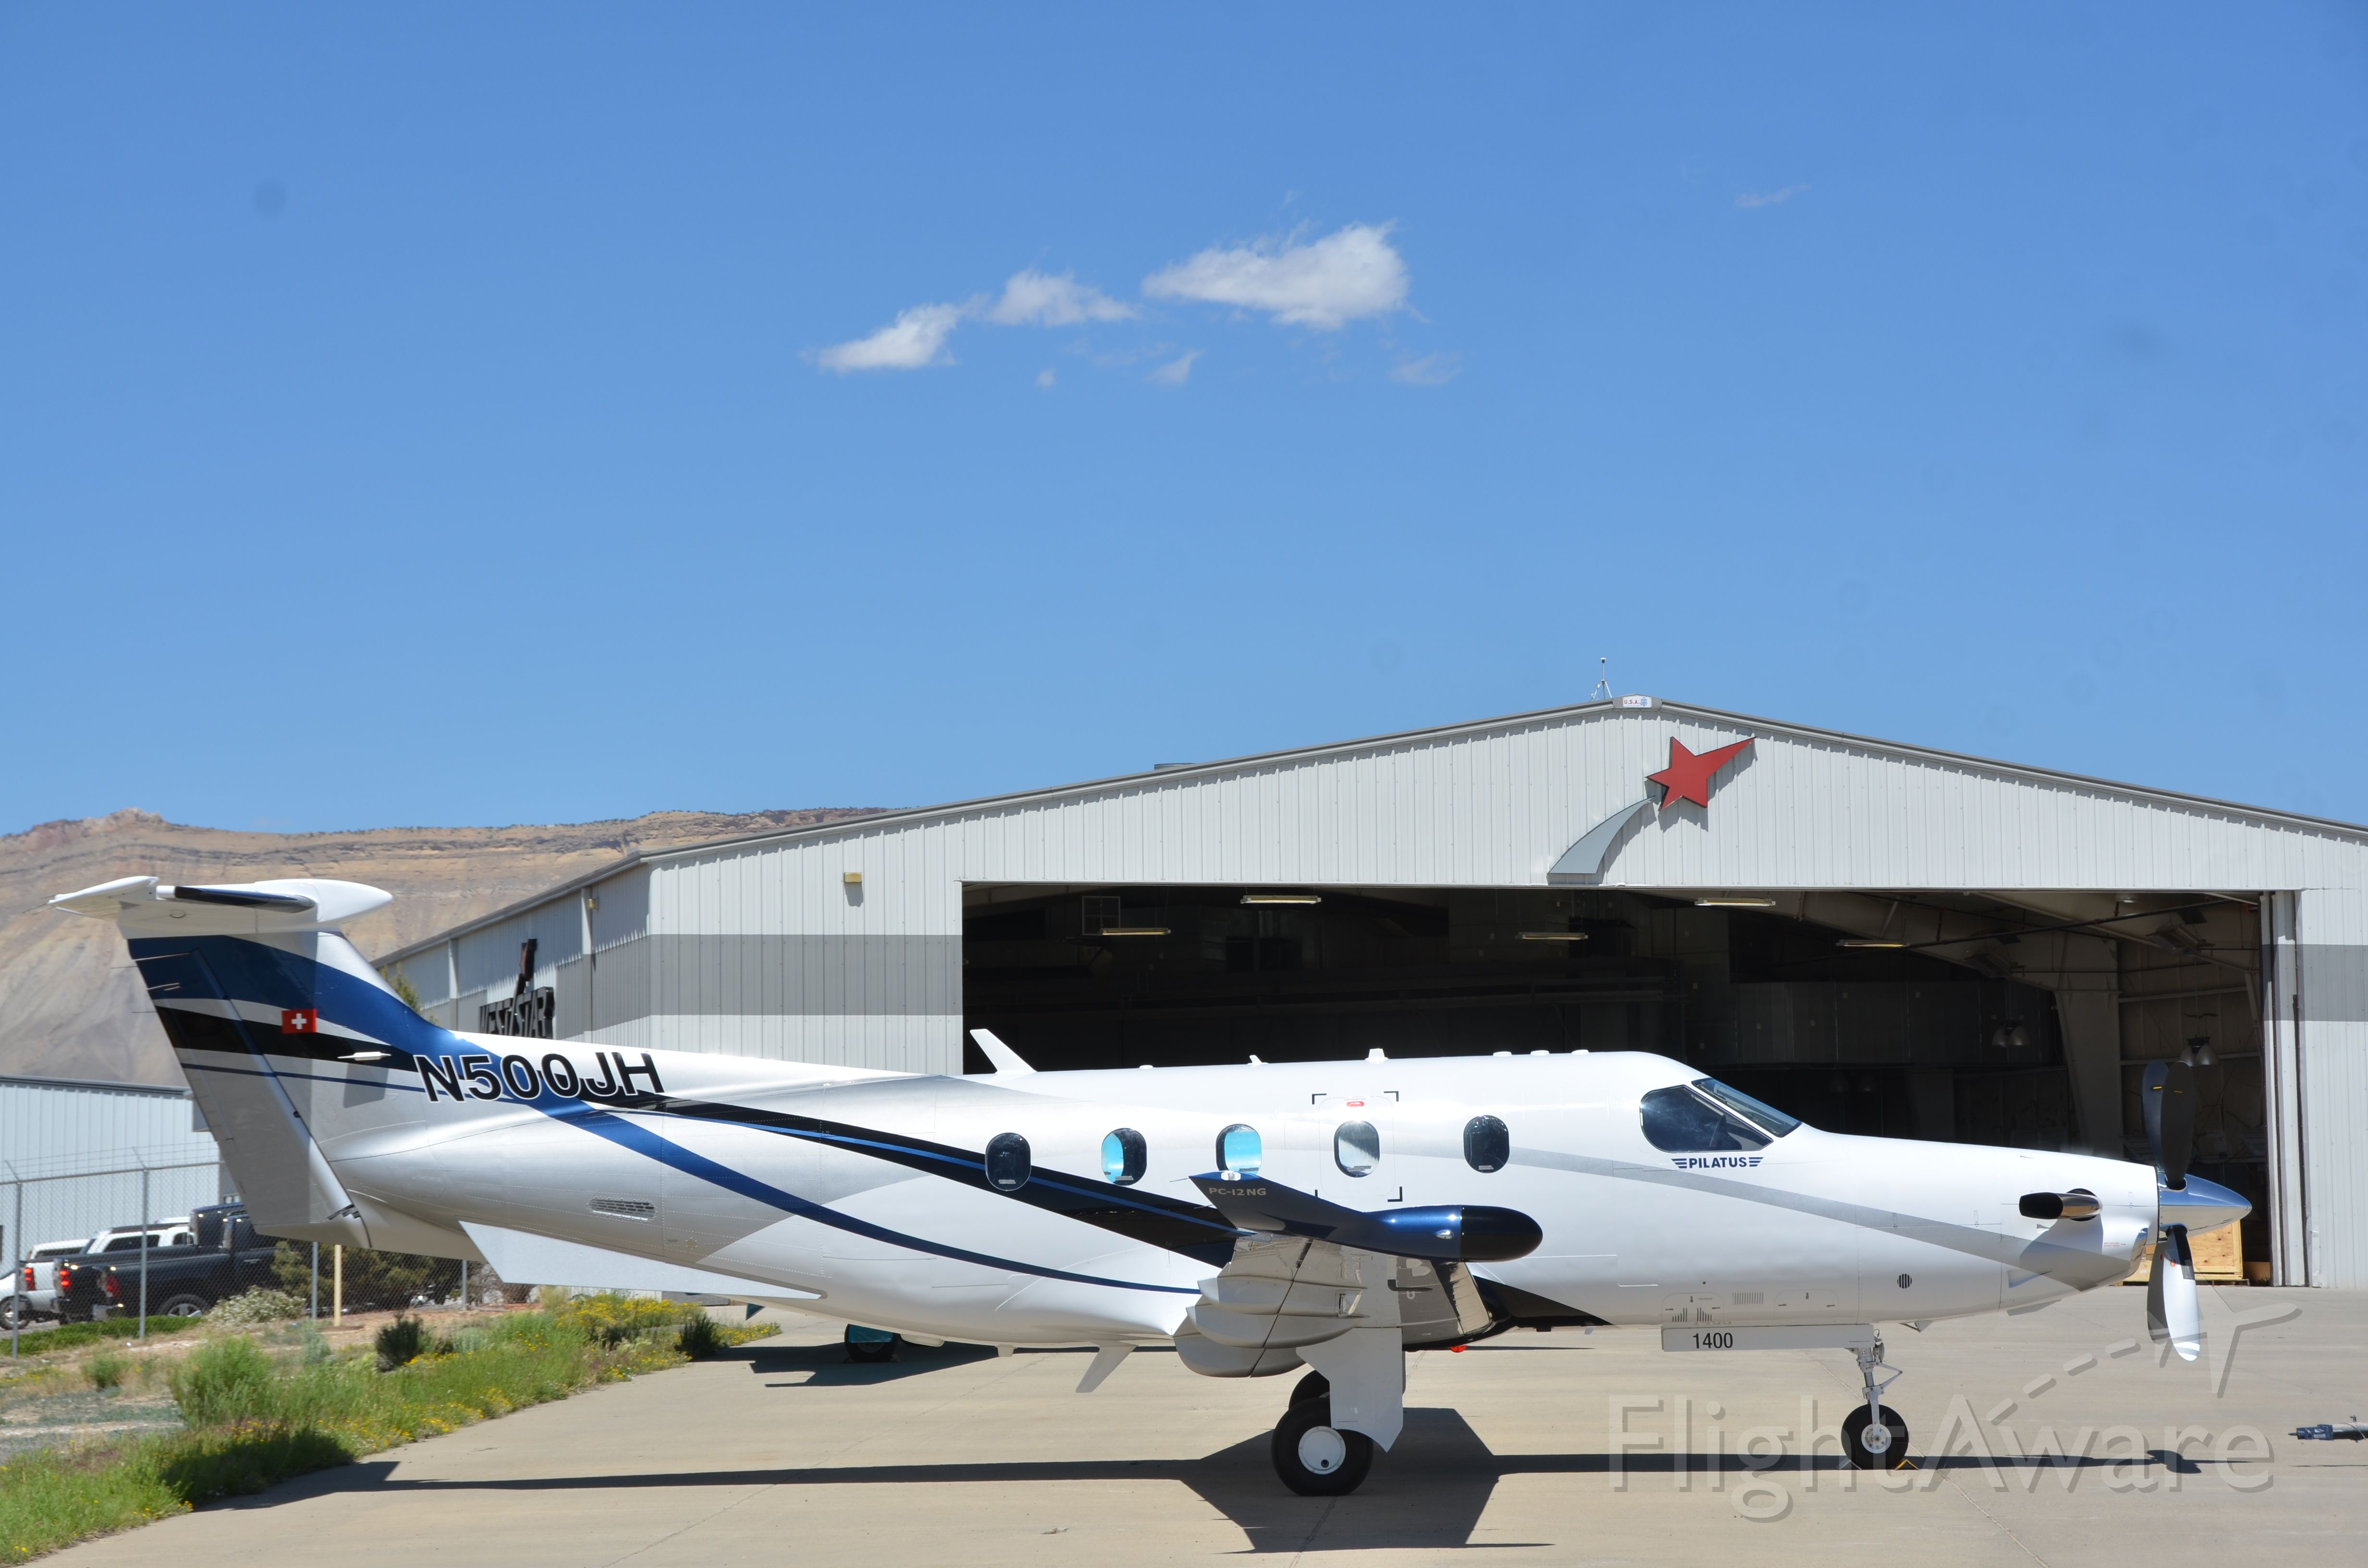 Pilatus PC-12 (N500JH) - Pretty new paint stripes.